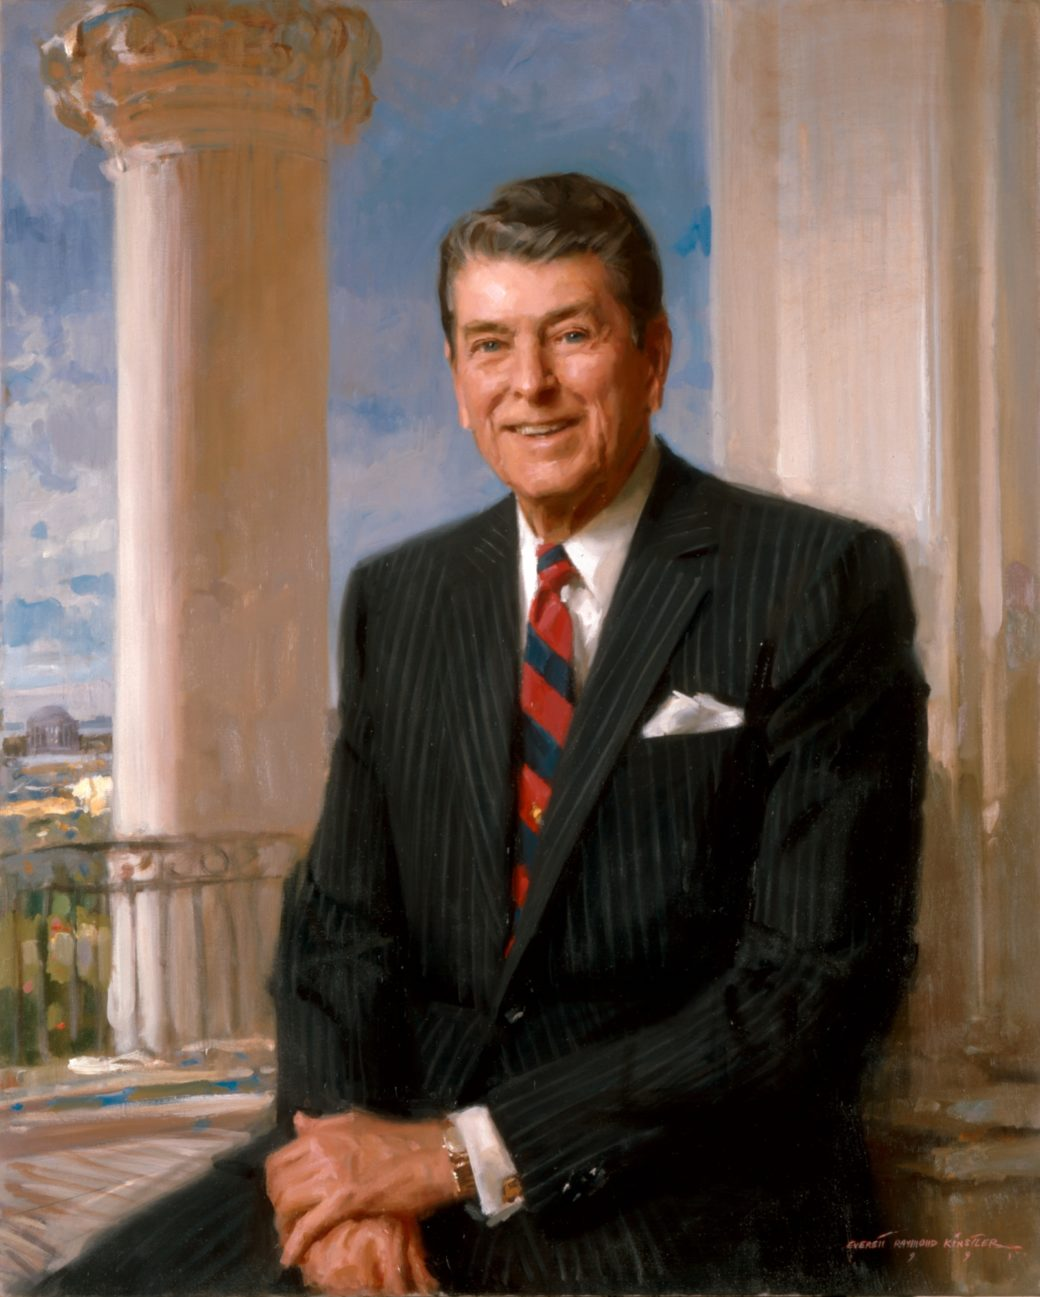 Ronald Reagan - White House Historical Association